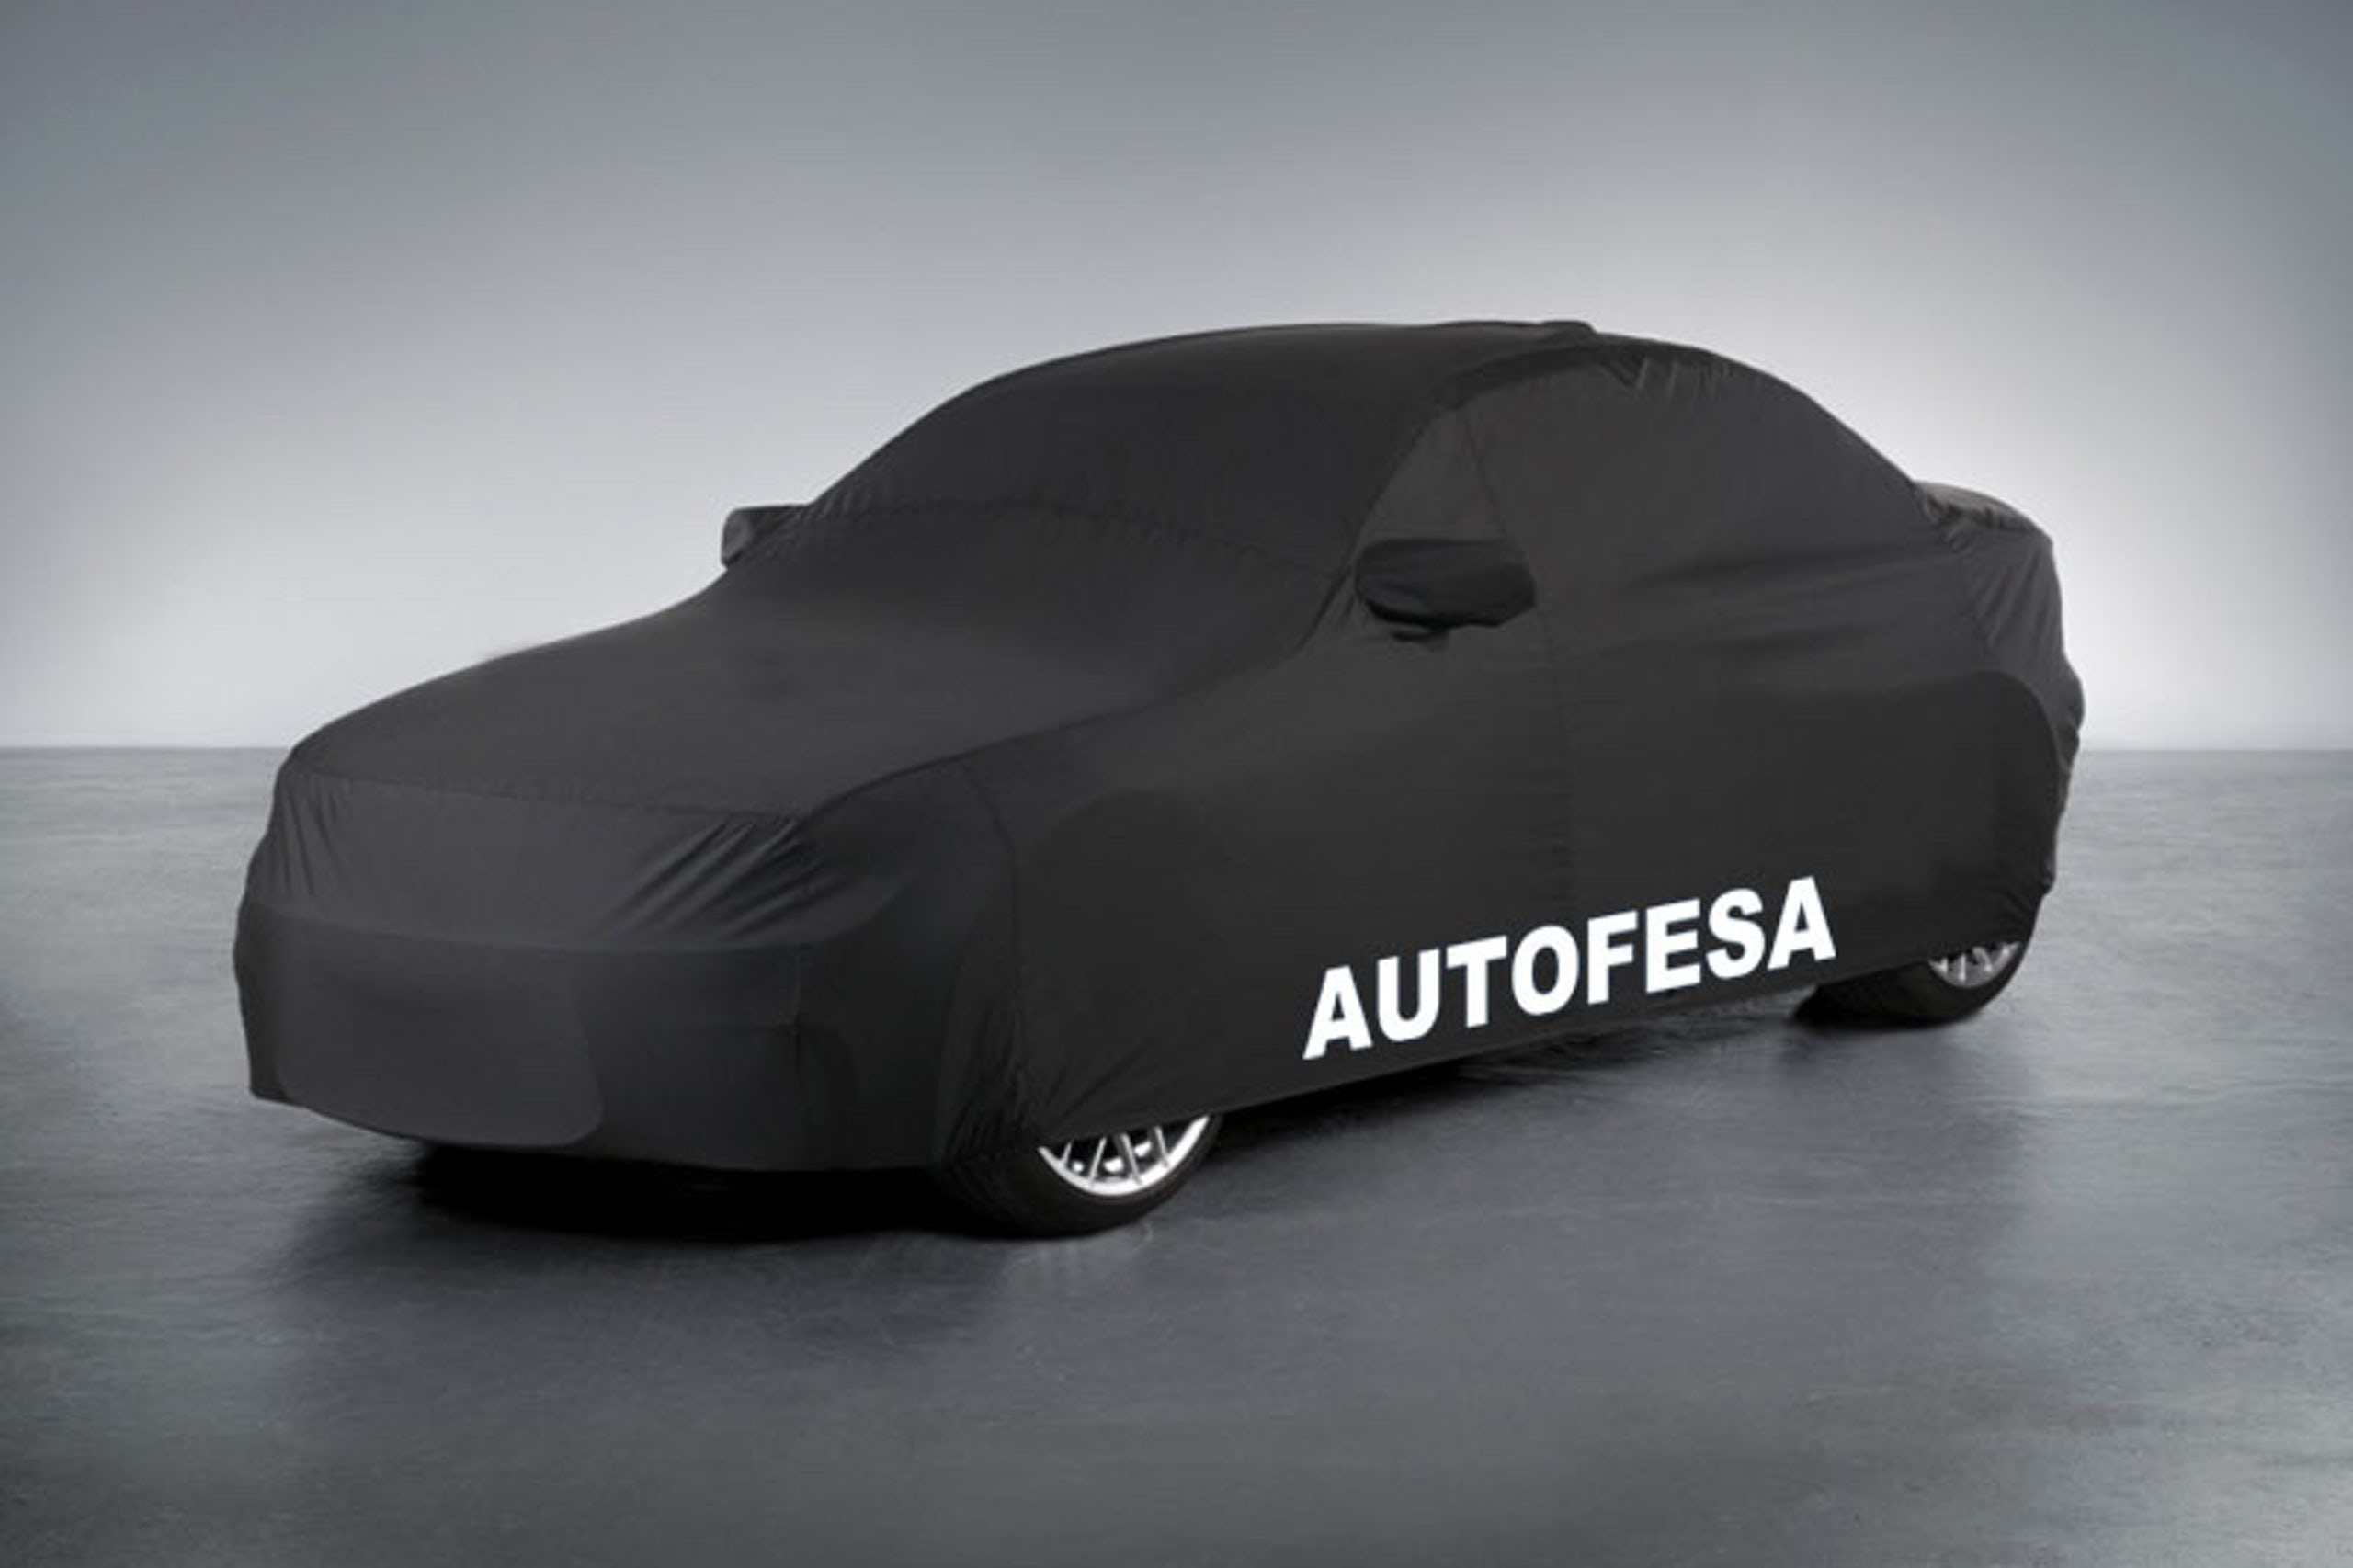 Audi Q5 2.0 TDI 170cv quattro 5p S tronic Auto - Foto 32